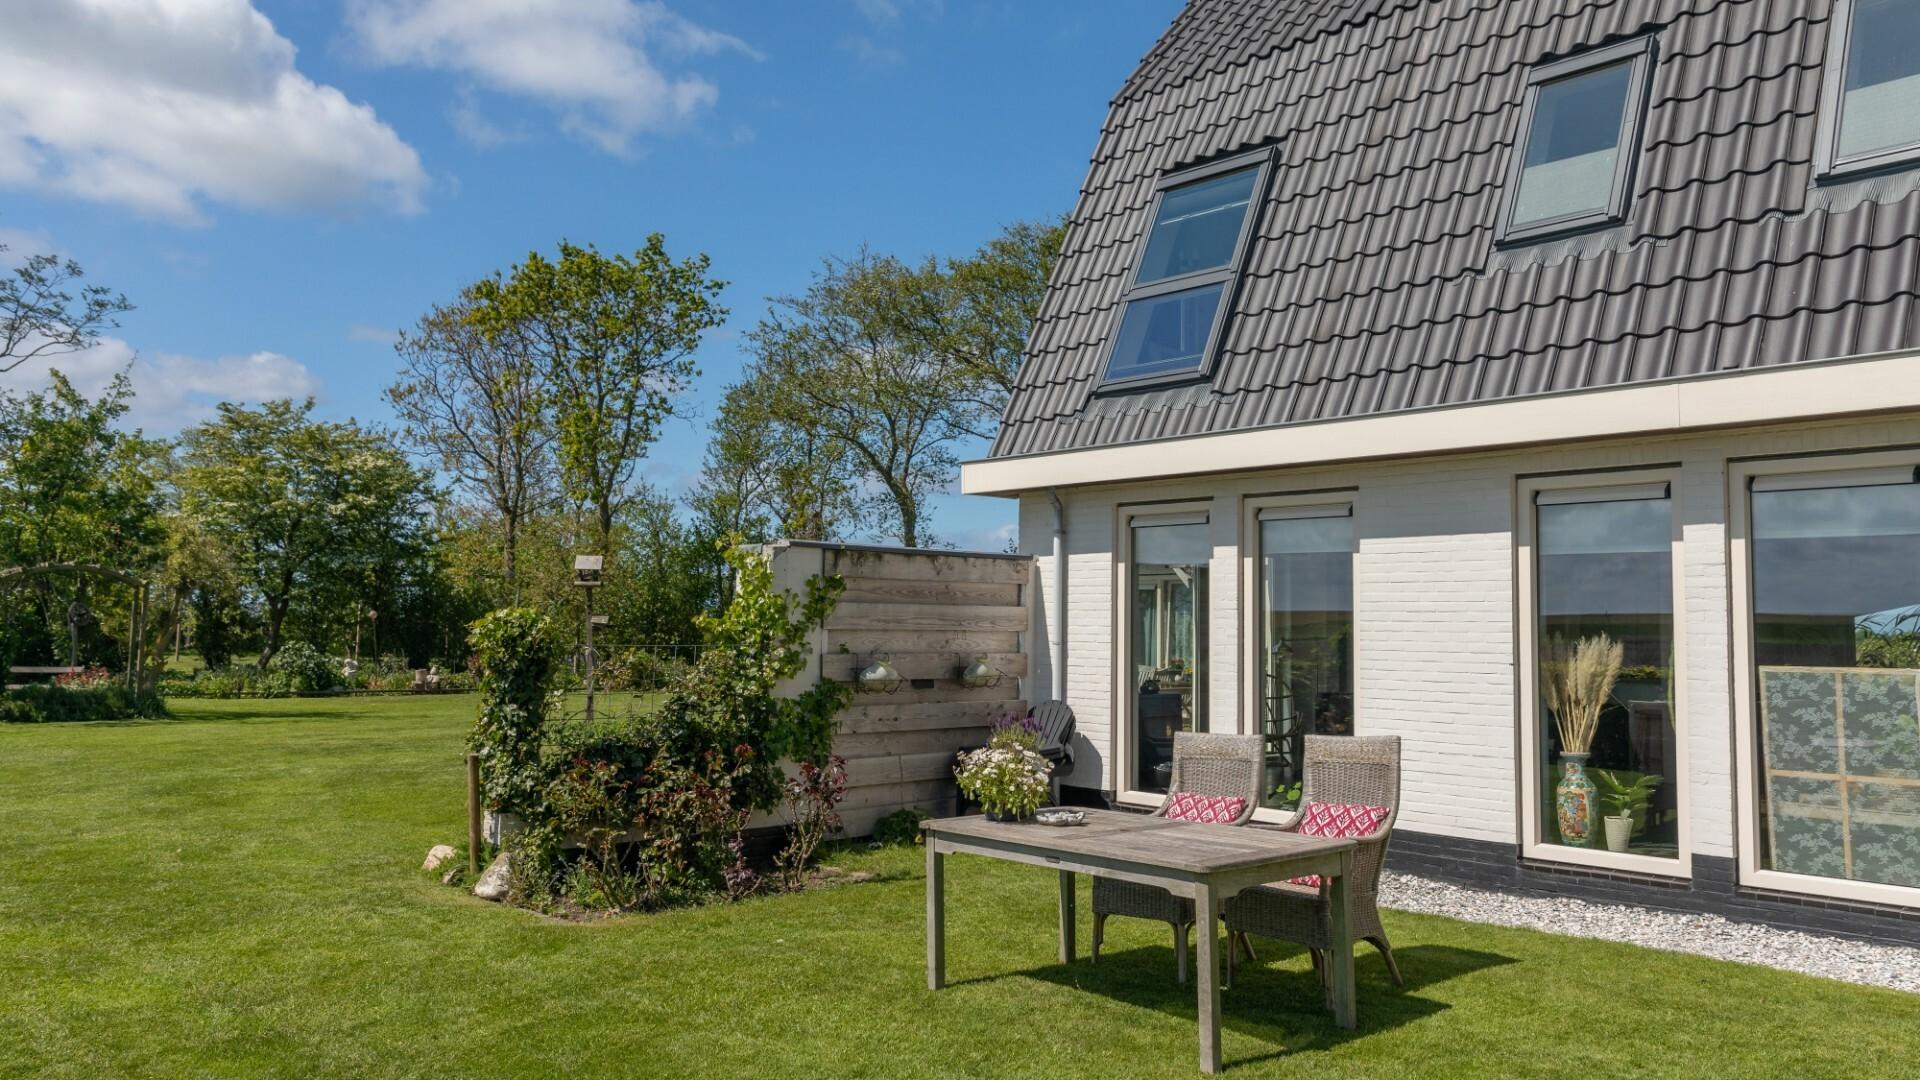 Tuin bed en breakfast Wad Uniek VVV Texel